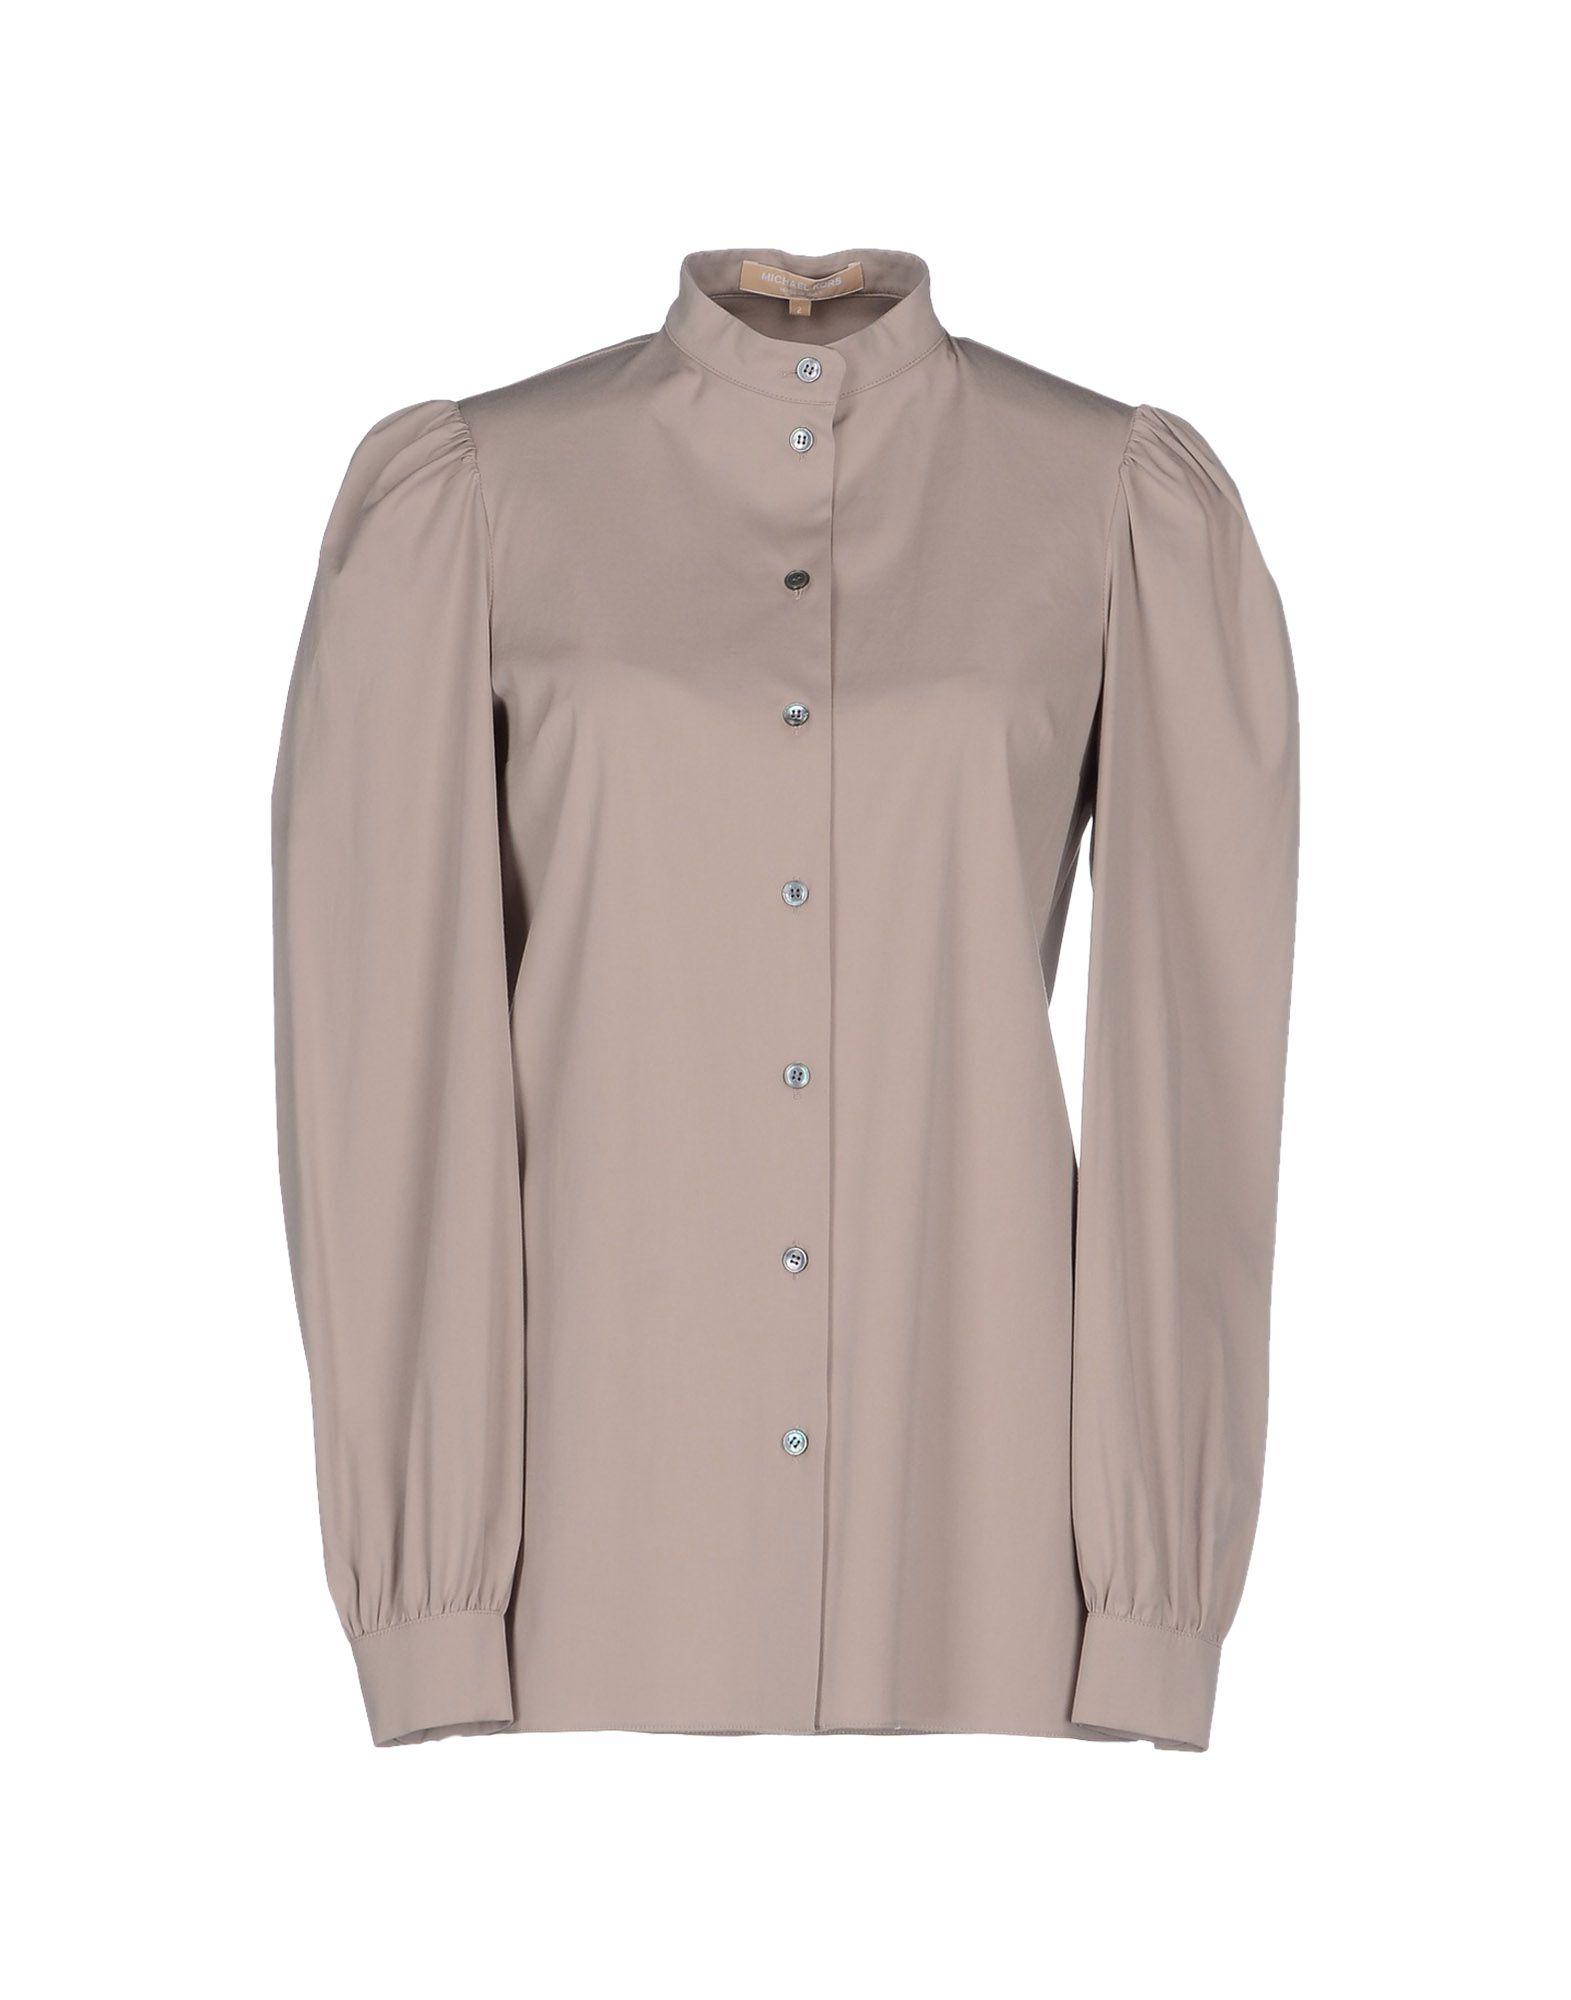 michael kors shirt in gray lyst. Black Bedroom Furniture Sets. Home Design Ideas